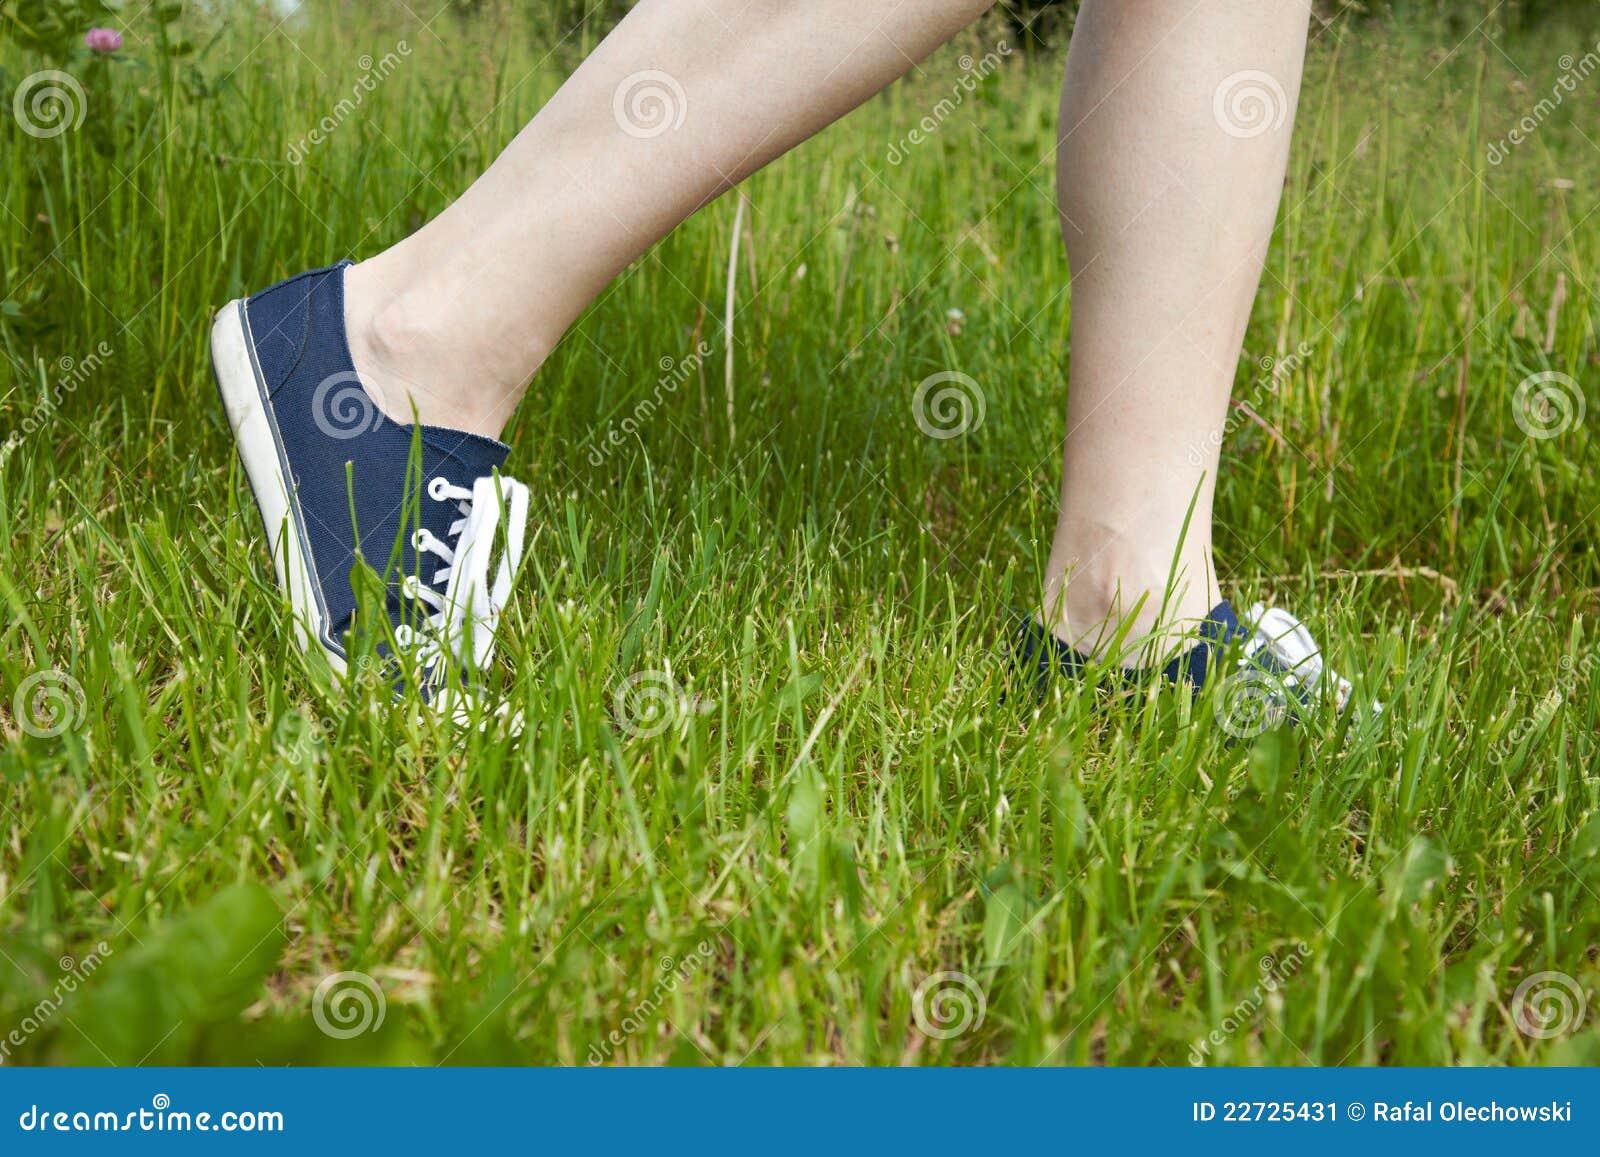 woman walking in grass - photo #17